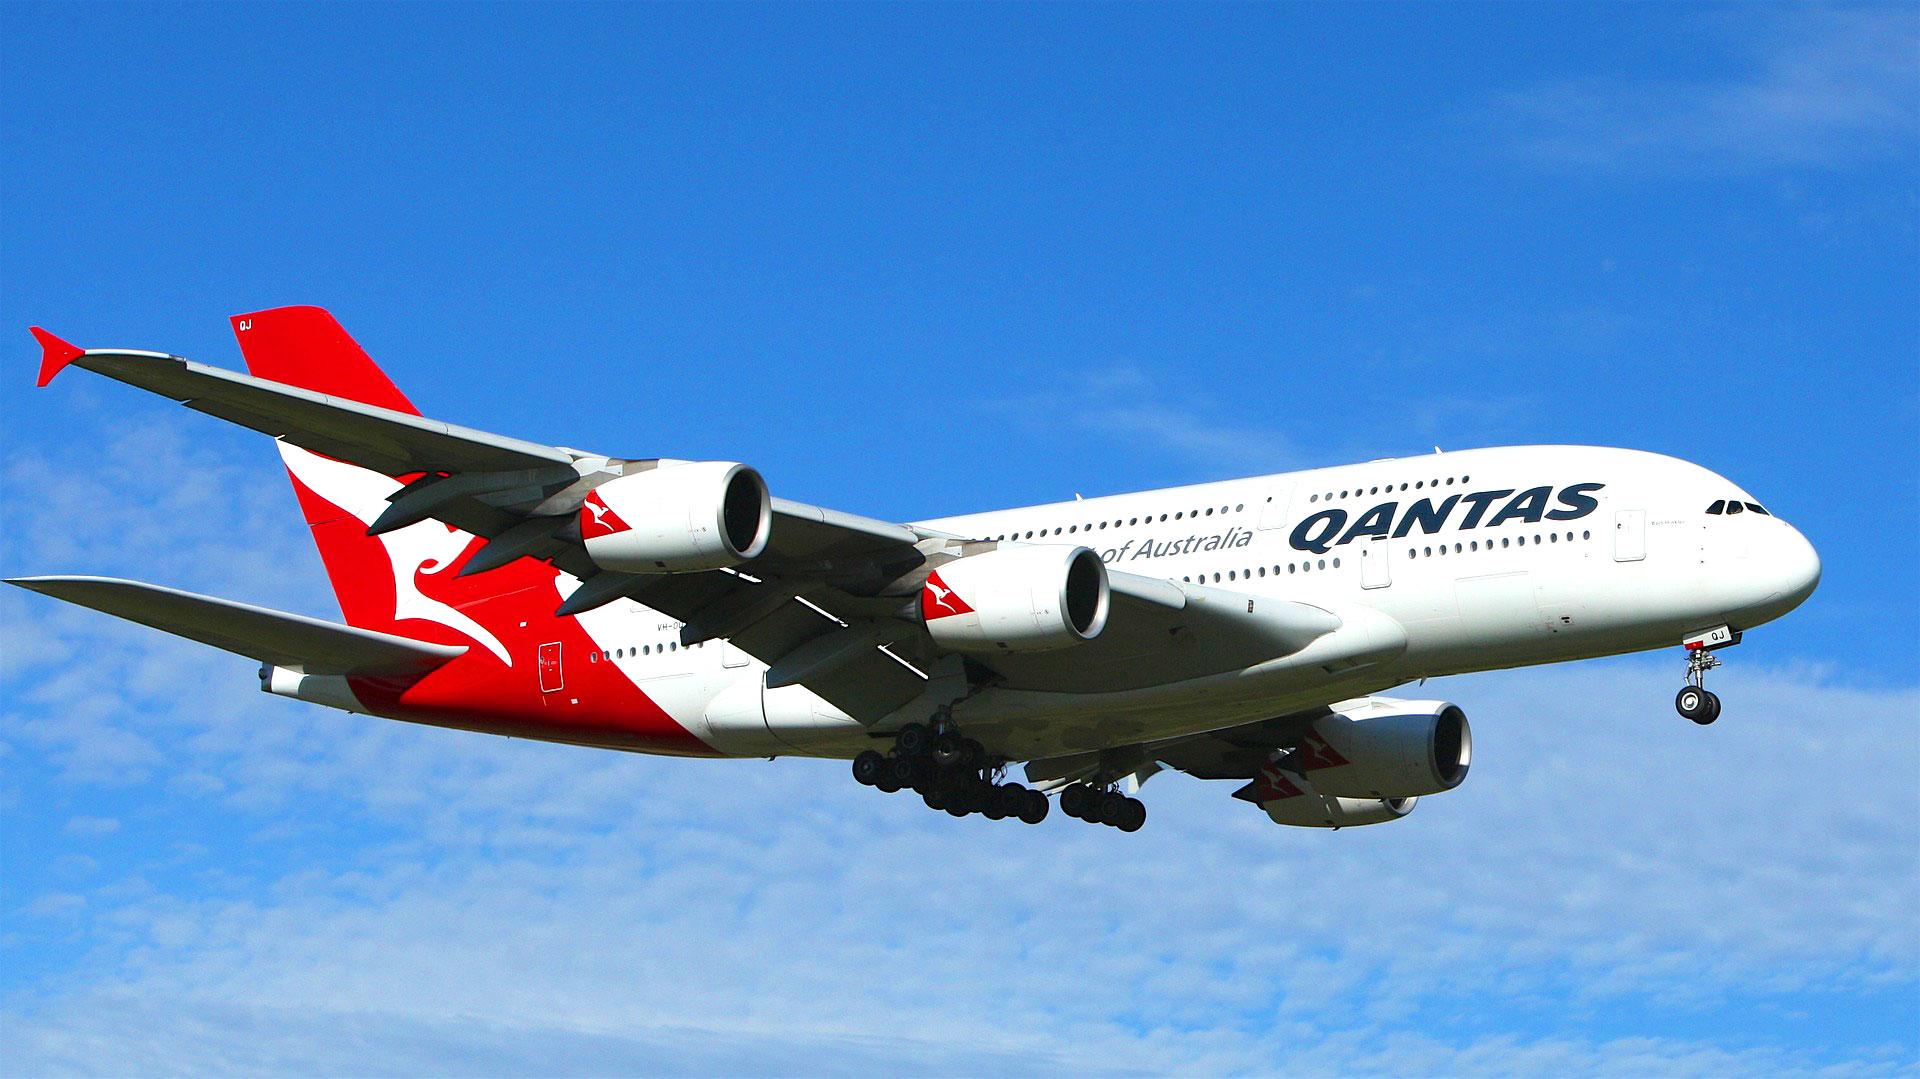 Qantas jet image